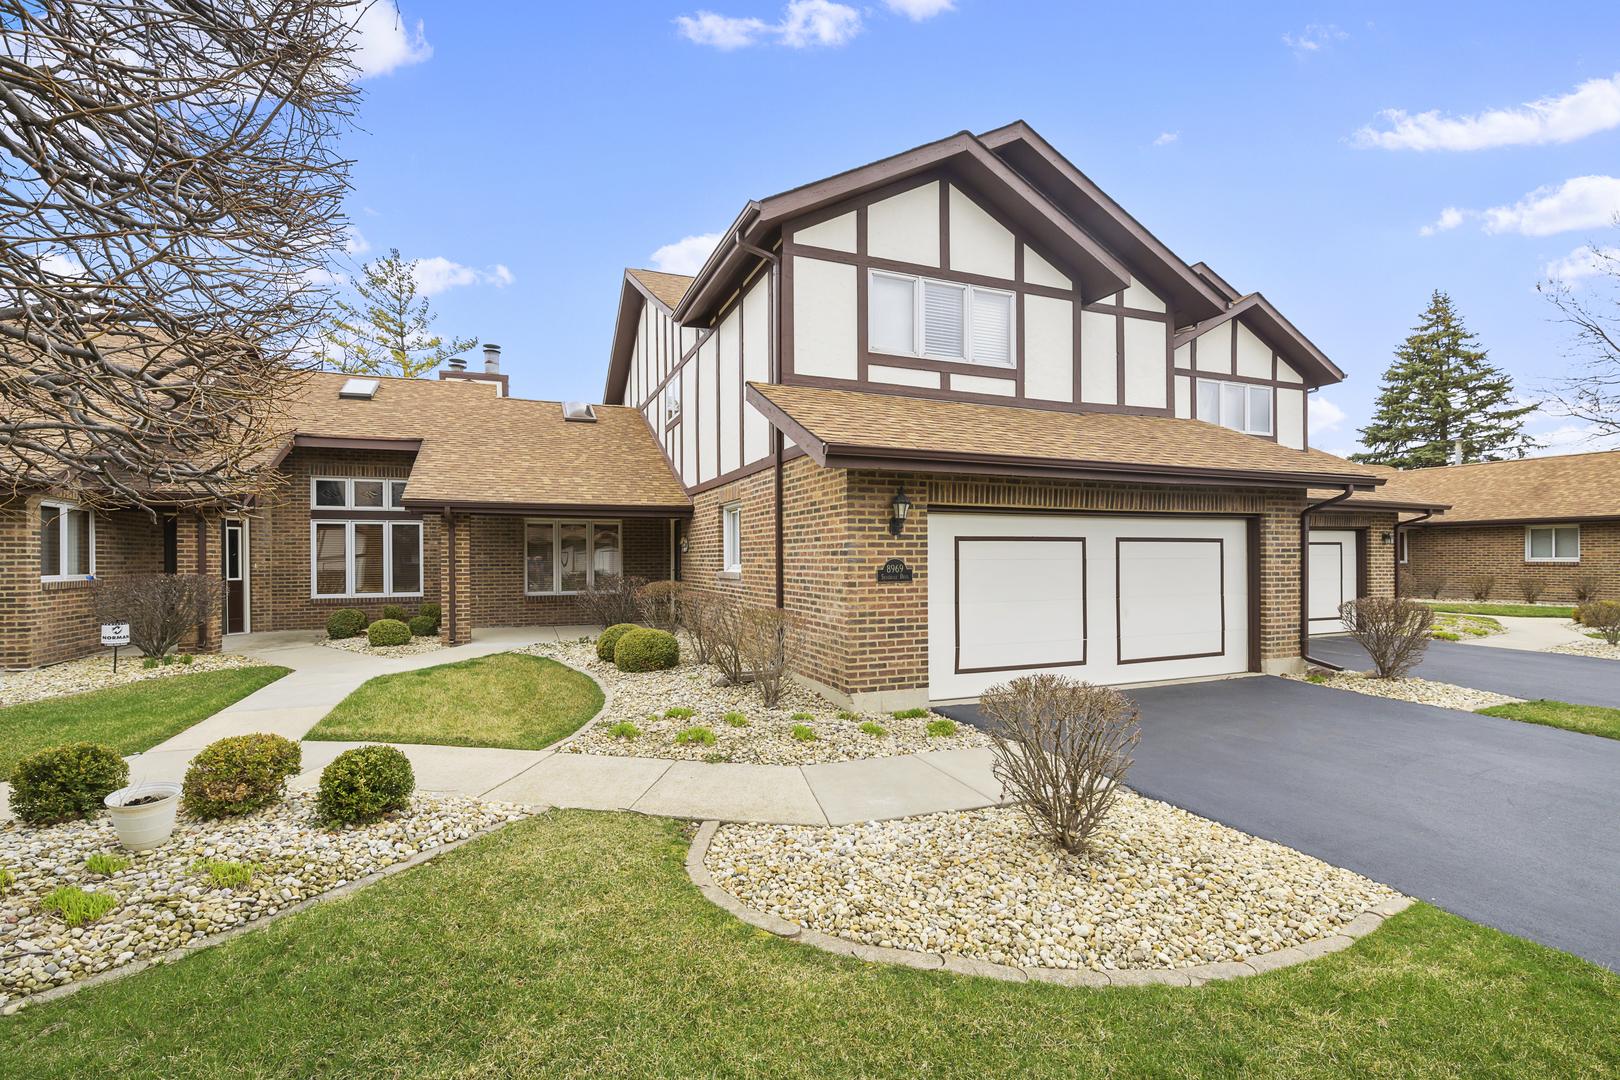 8969 Silverdale Drive, Orland Park, Illinois